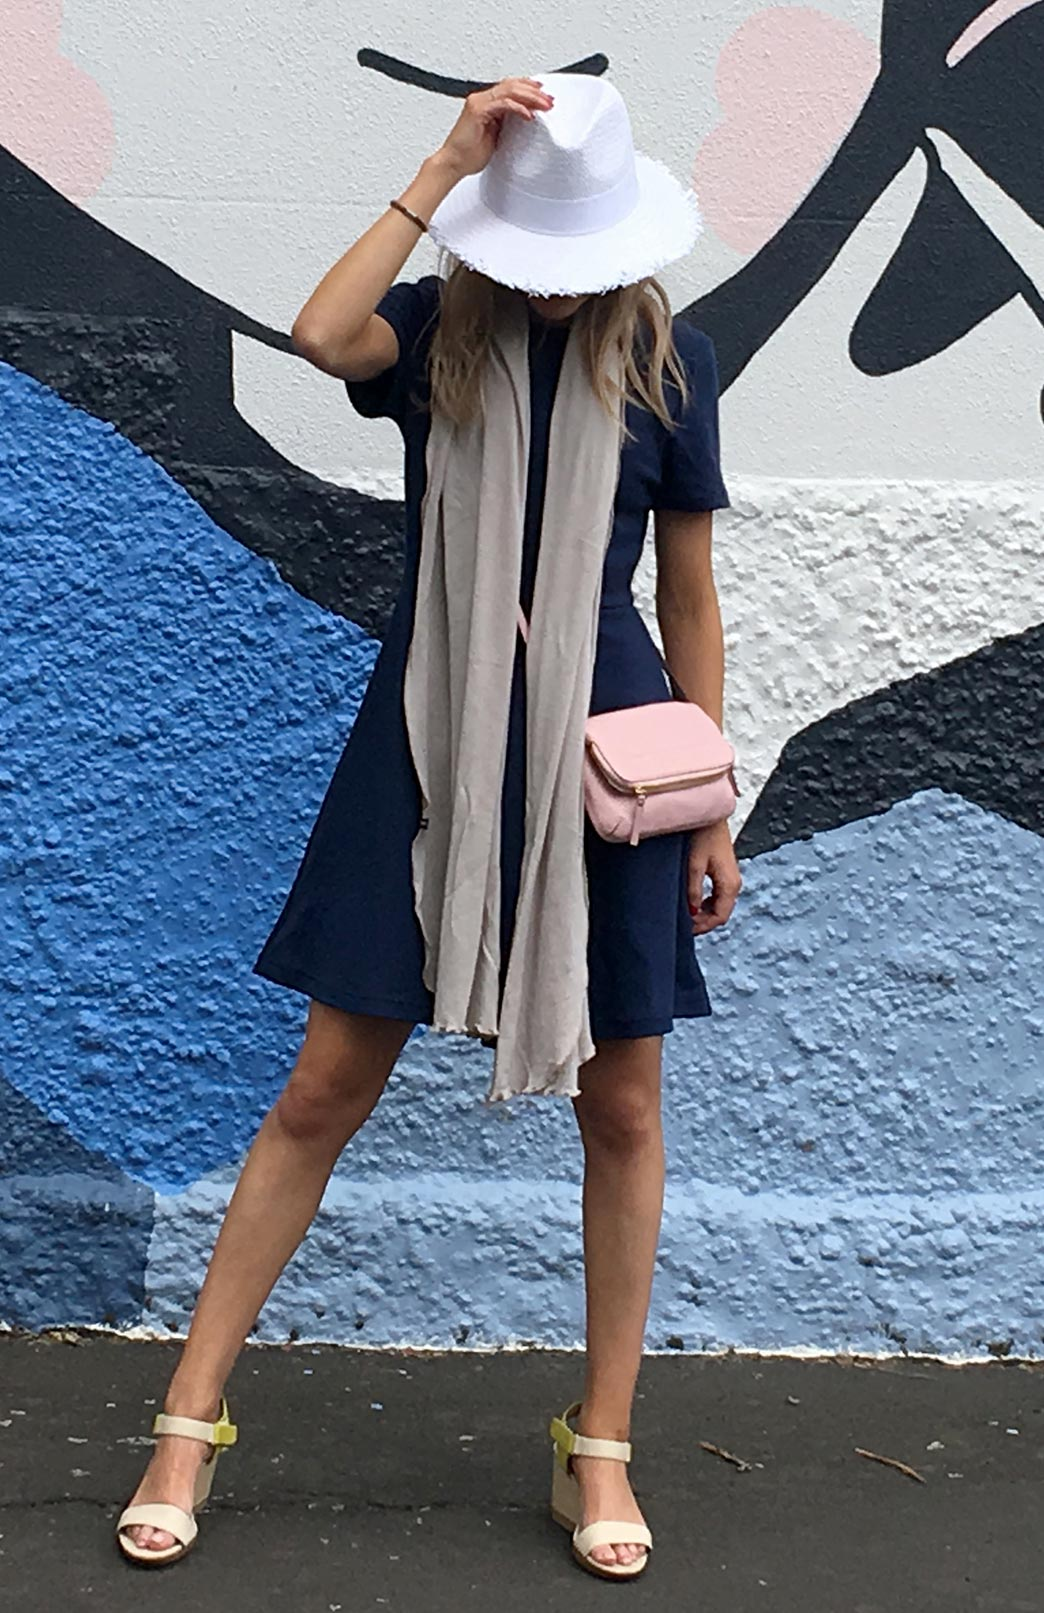 Scarves - Plain - Women's Superfine Merino Wool Classic Wide Scarf - Smitten Merino Tasmania Australia